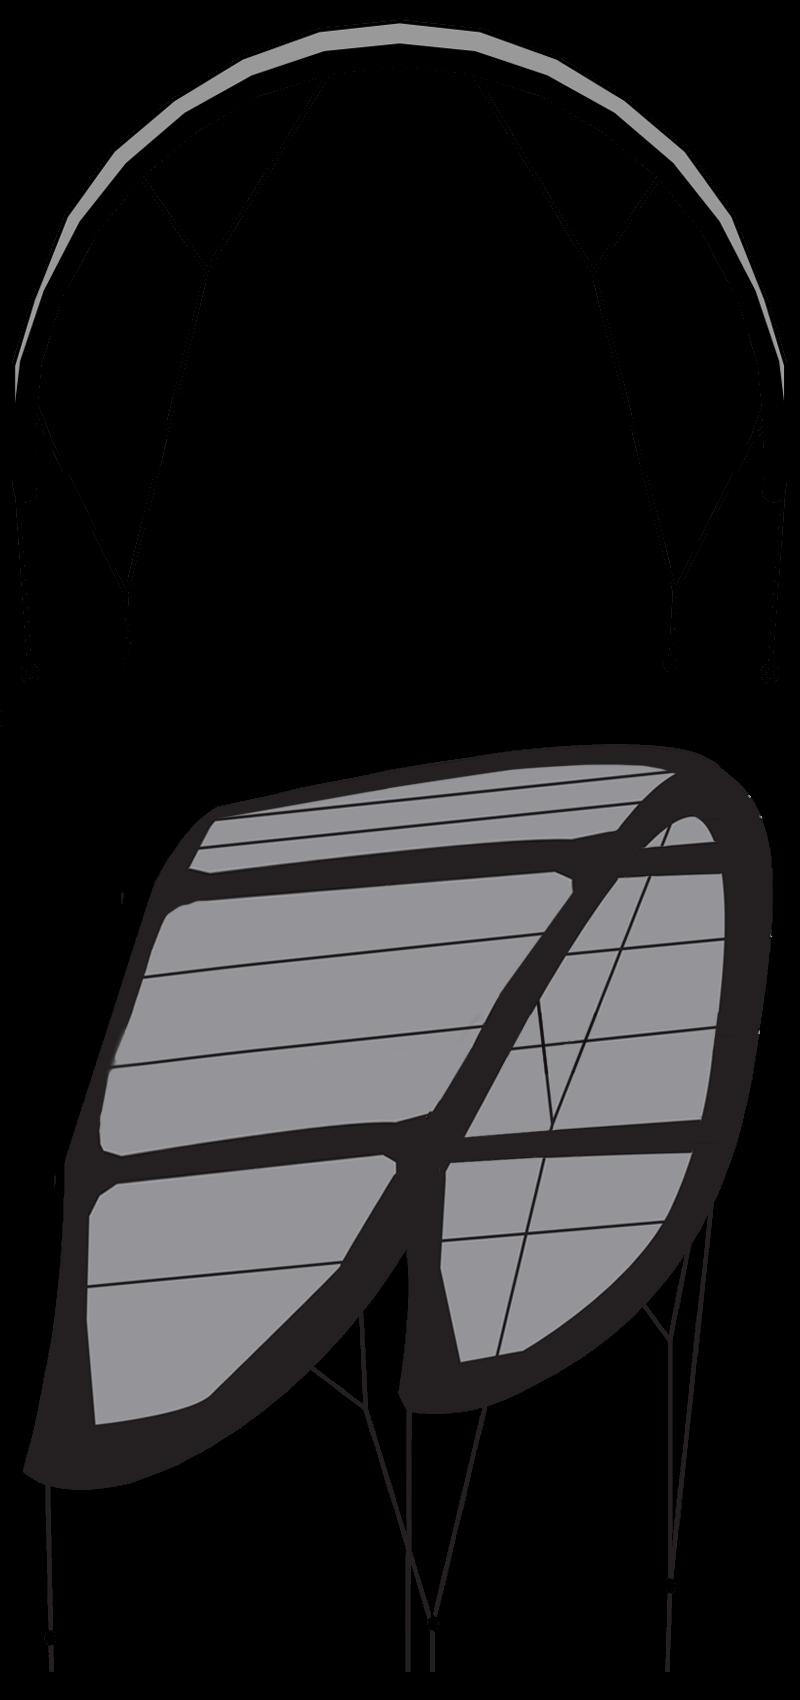 5 aile de kitesurf 5 lattes shape design